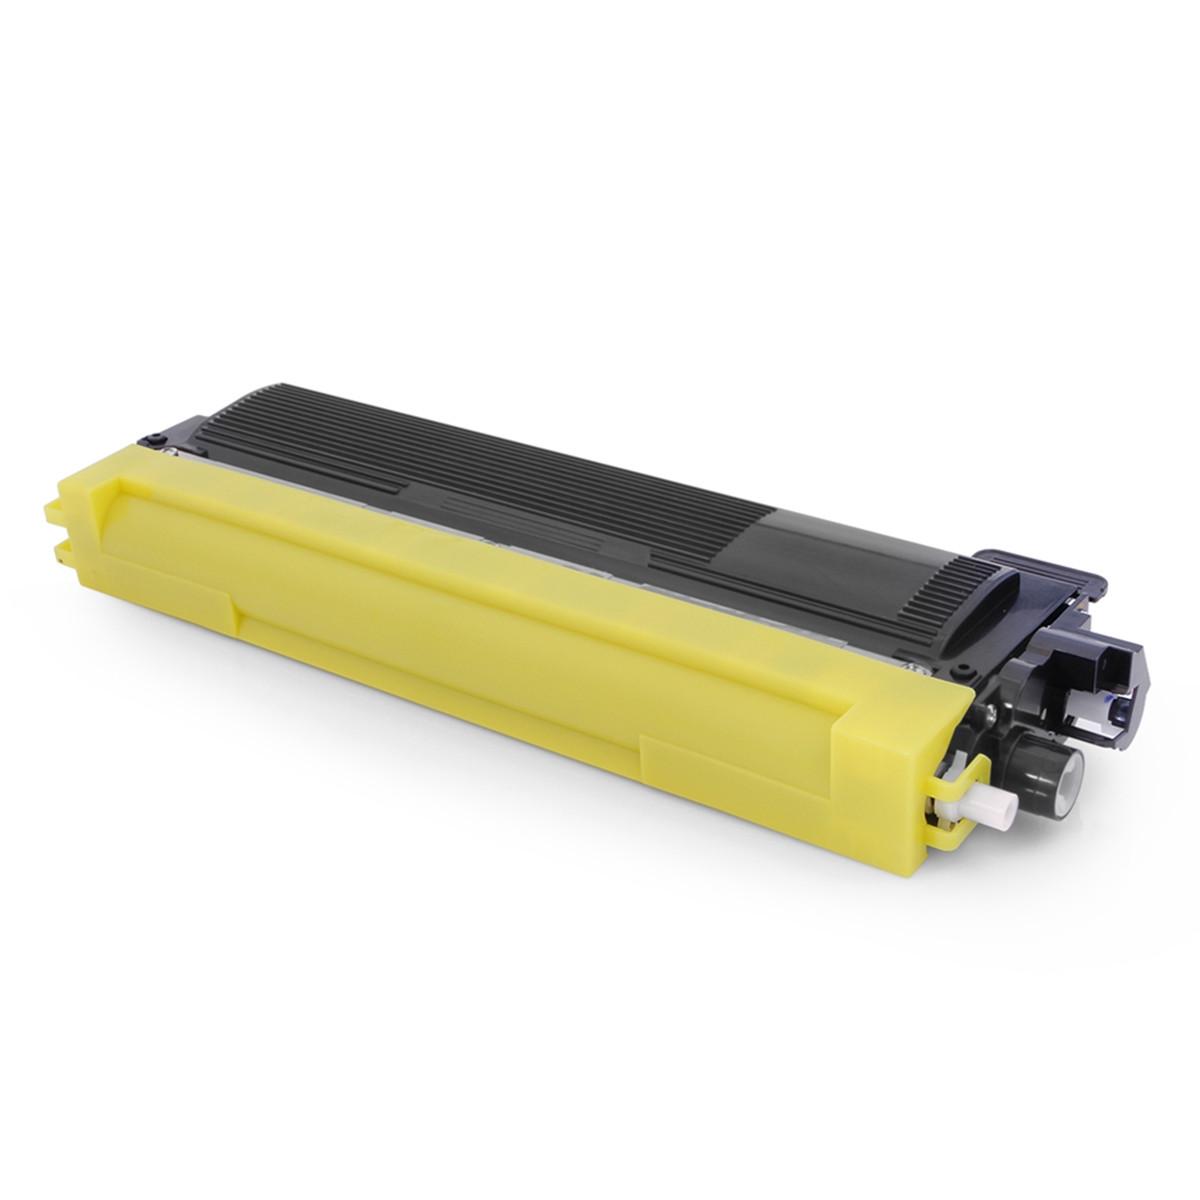 Toner Compatível com Brother TN230 TN230Y Amarelo | MFC9010CN MFC9320CW HL3040CN | Premium 1.4k